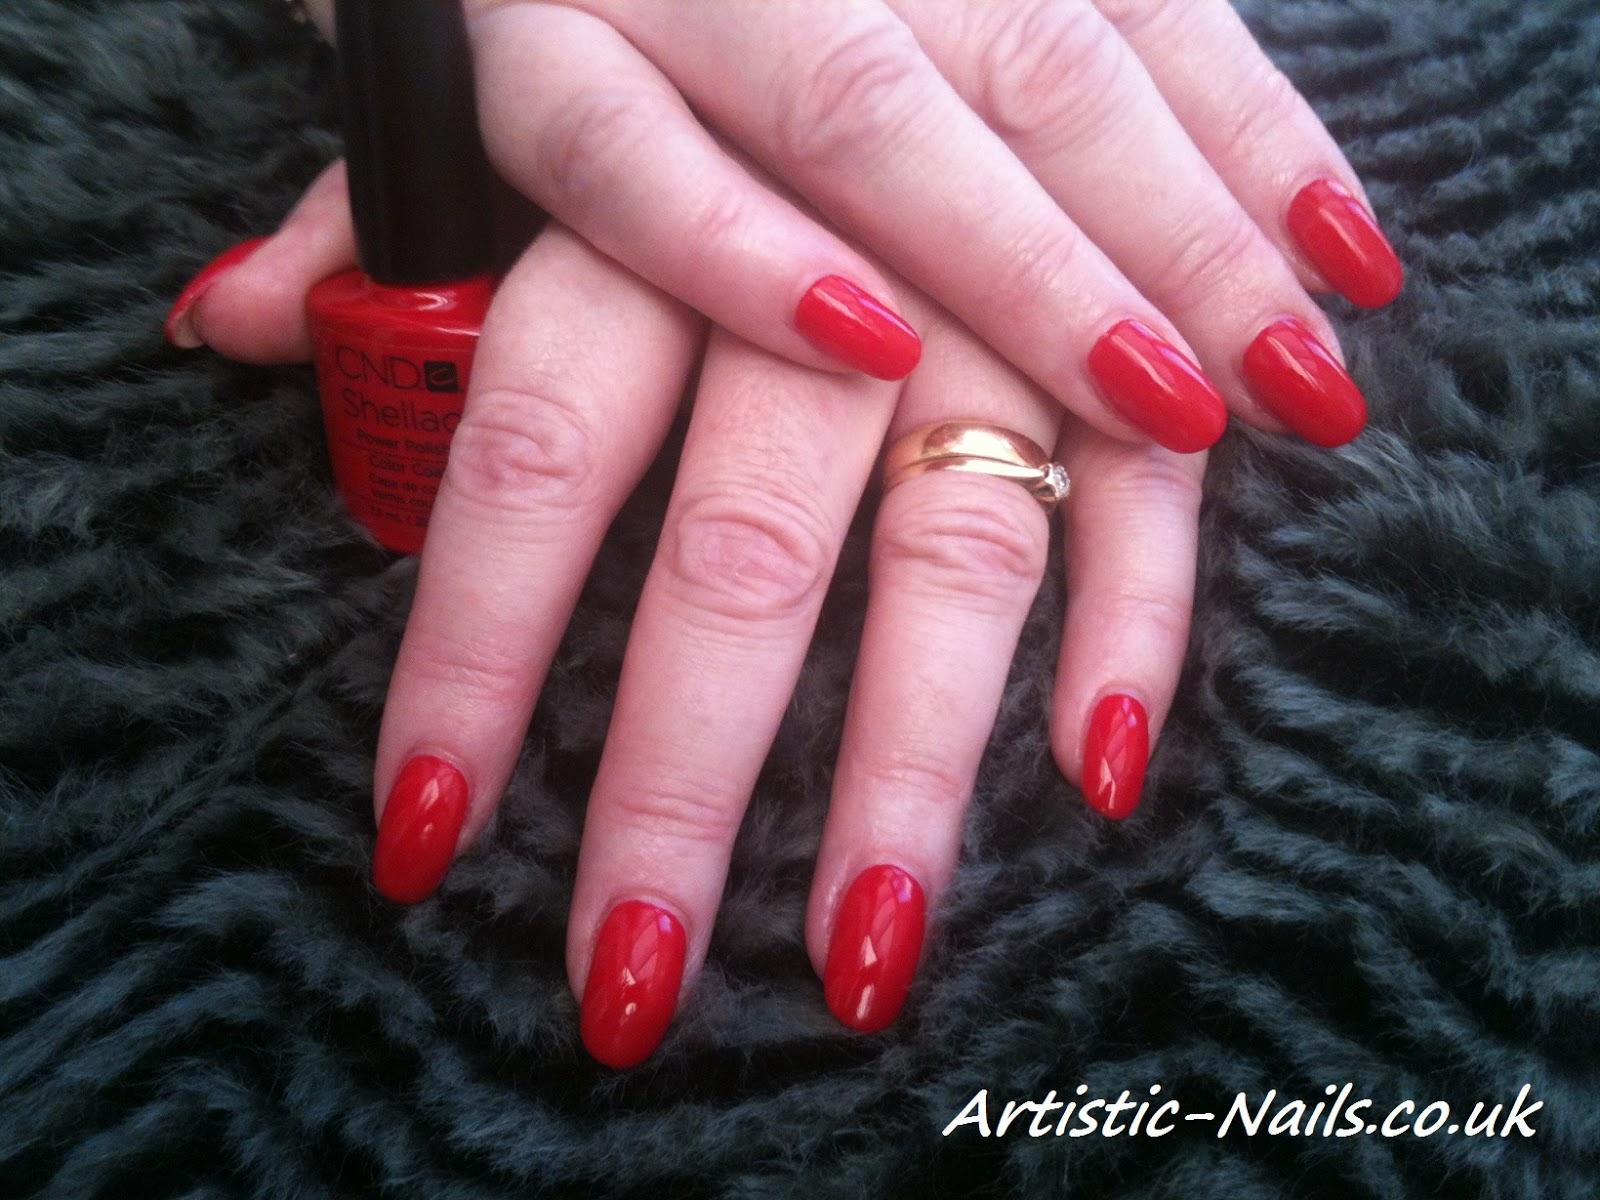 Artistic Nails Poole Uk Shellac Power Polish